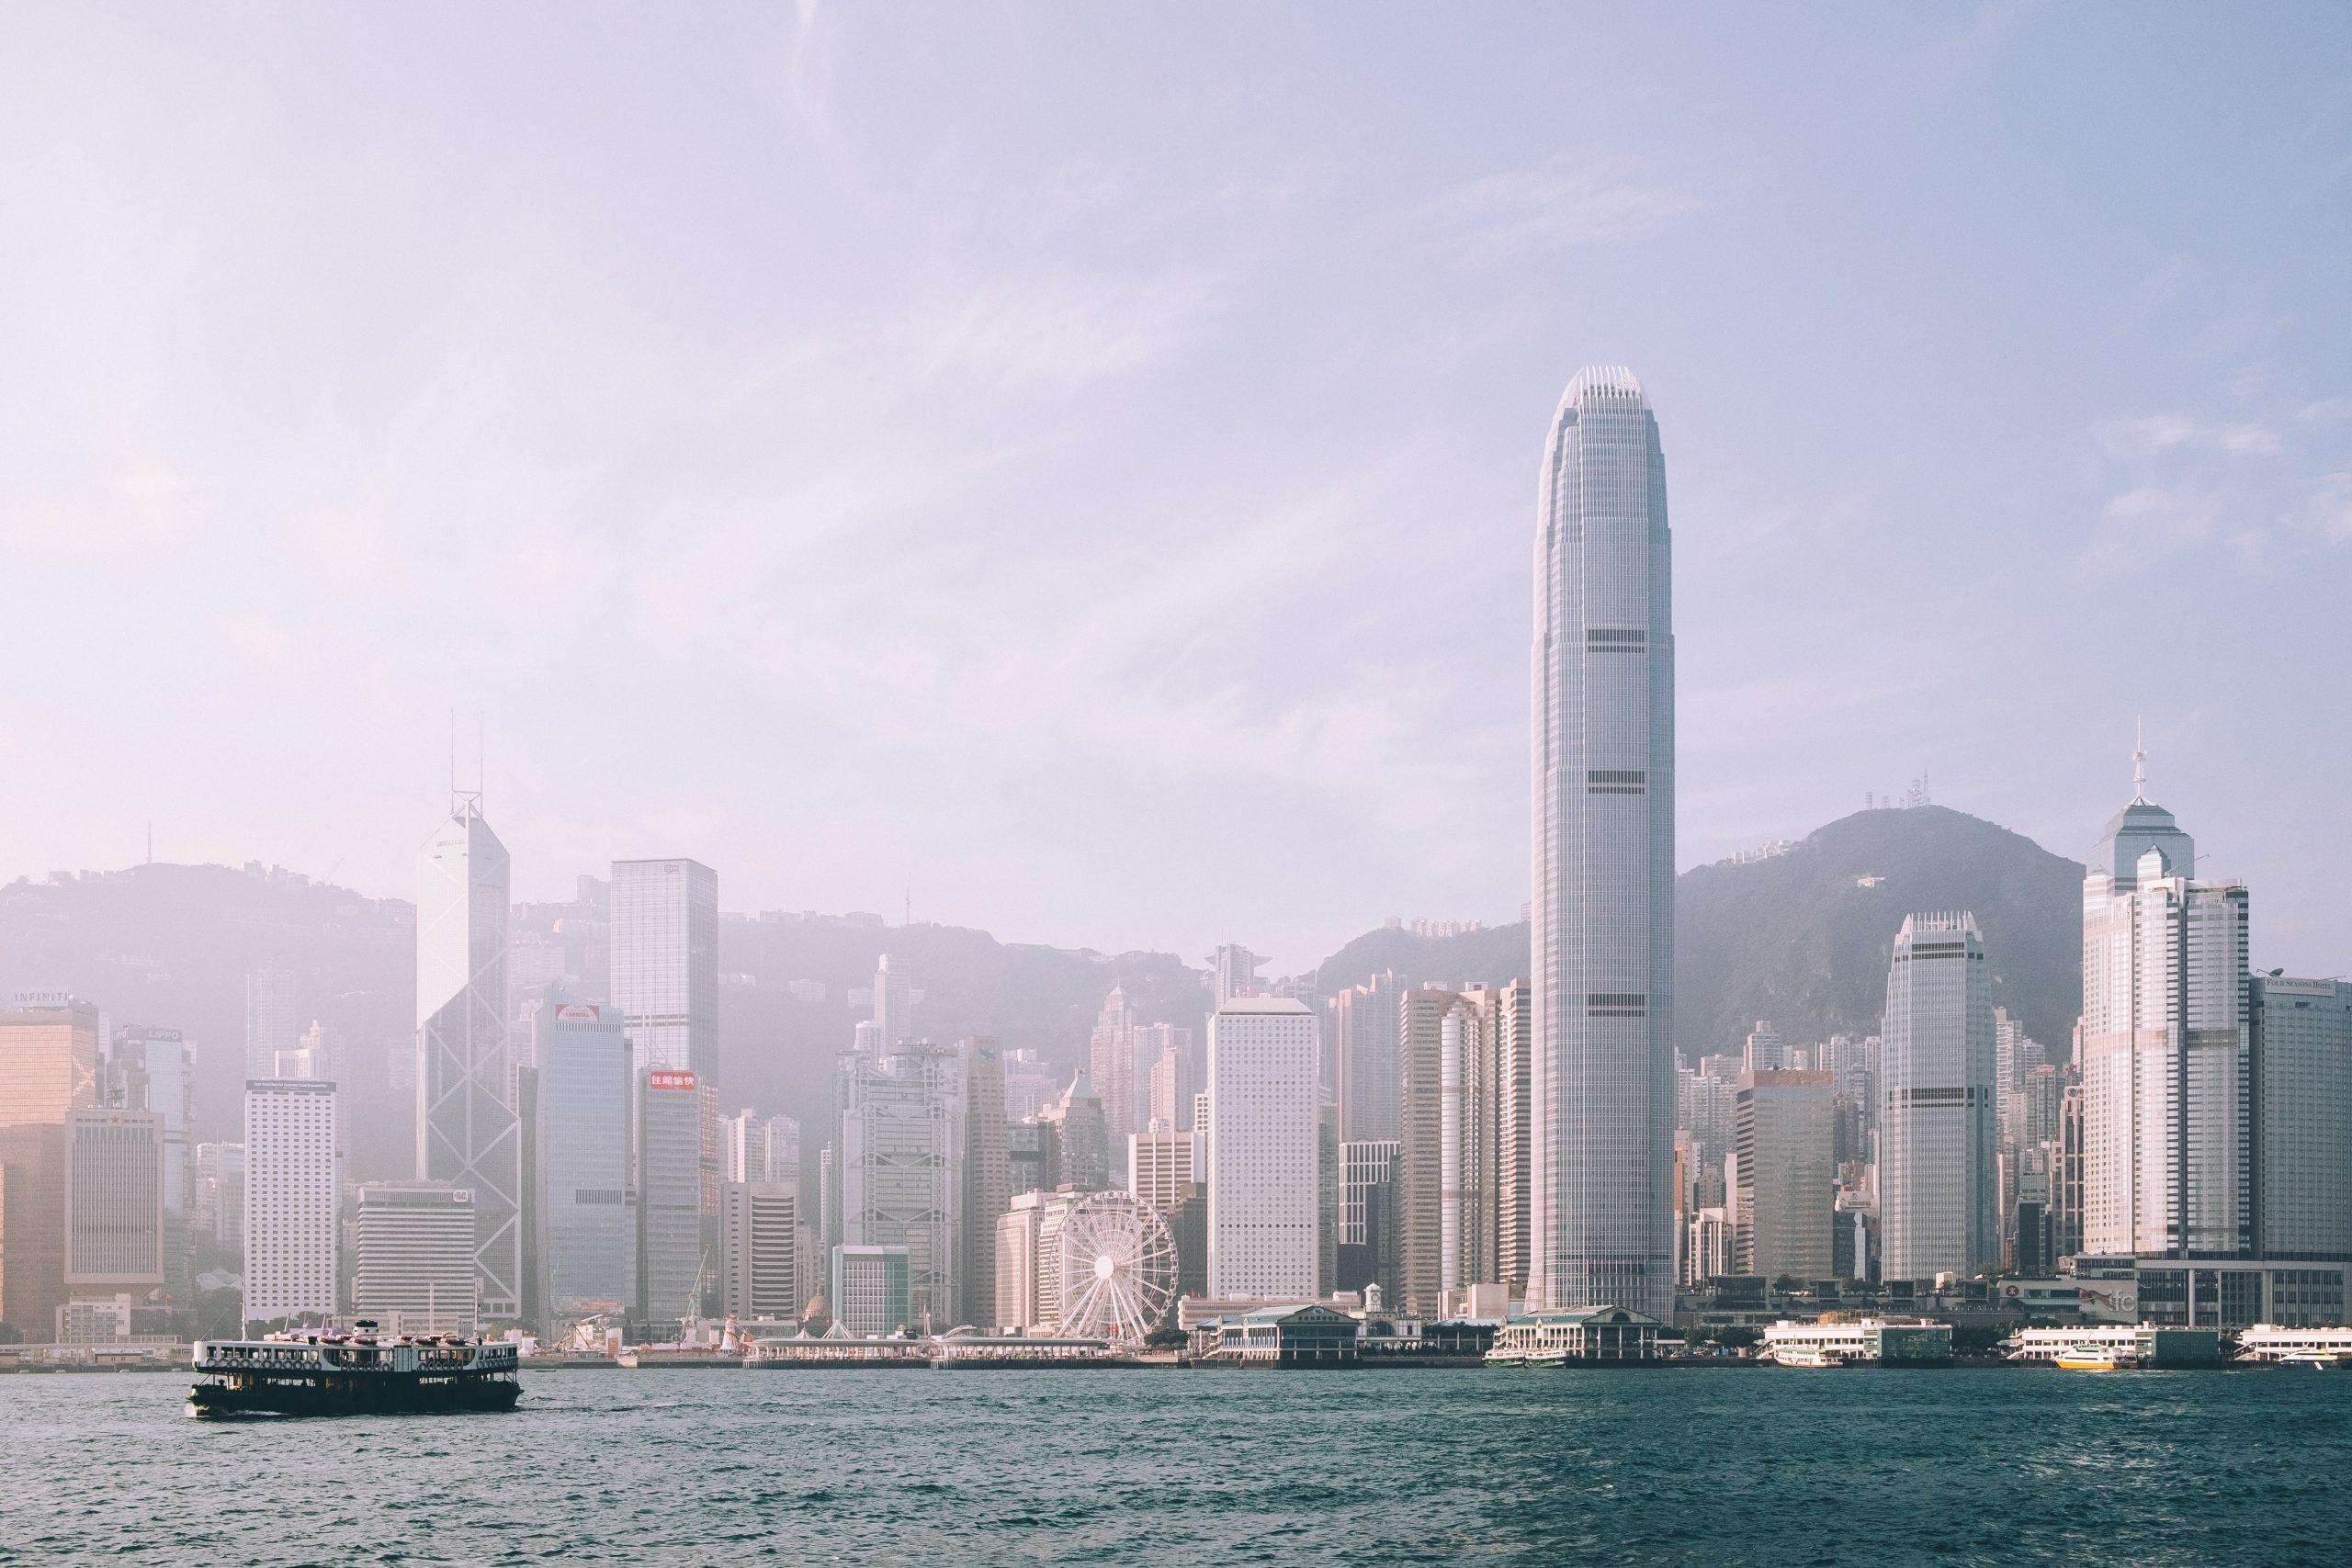 The Vanishing Hong Kong: China's Latest Casulaty